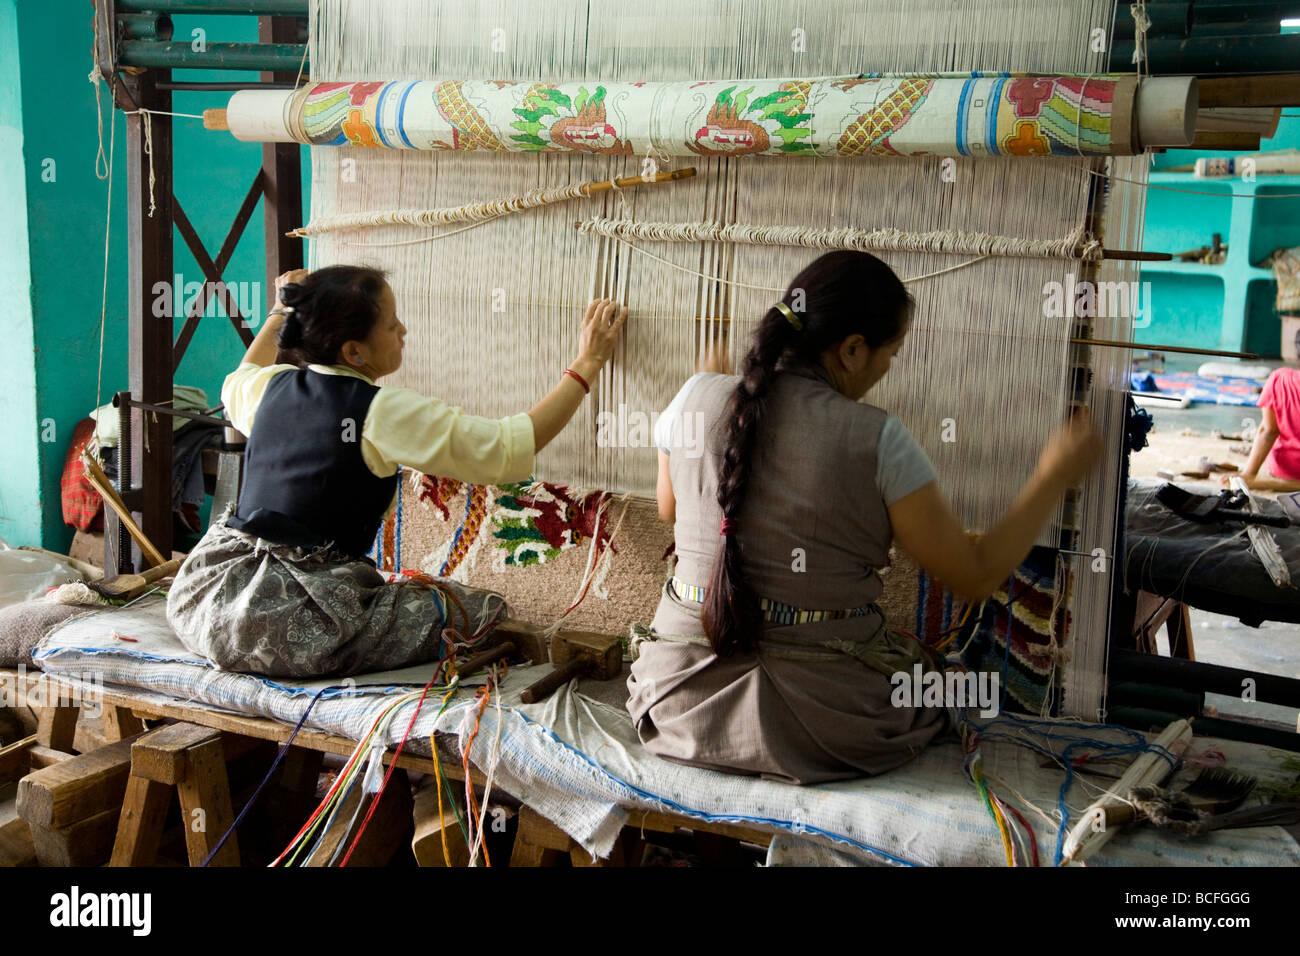 Two Women Carpet Weavers Work On A Loom At The Tibetan